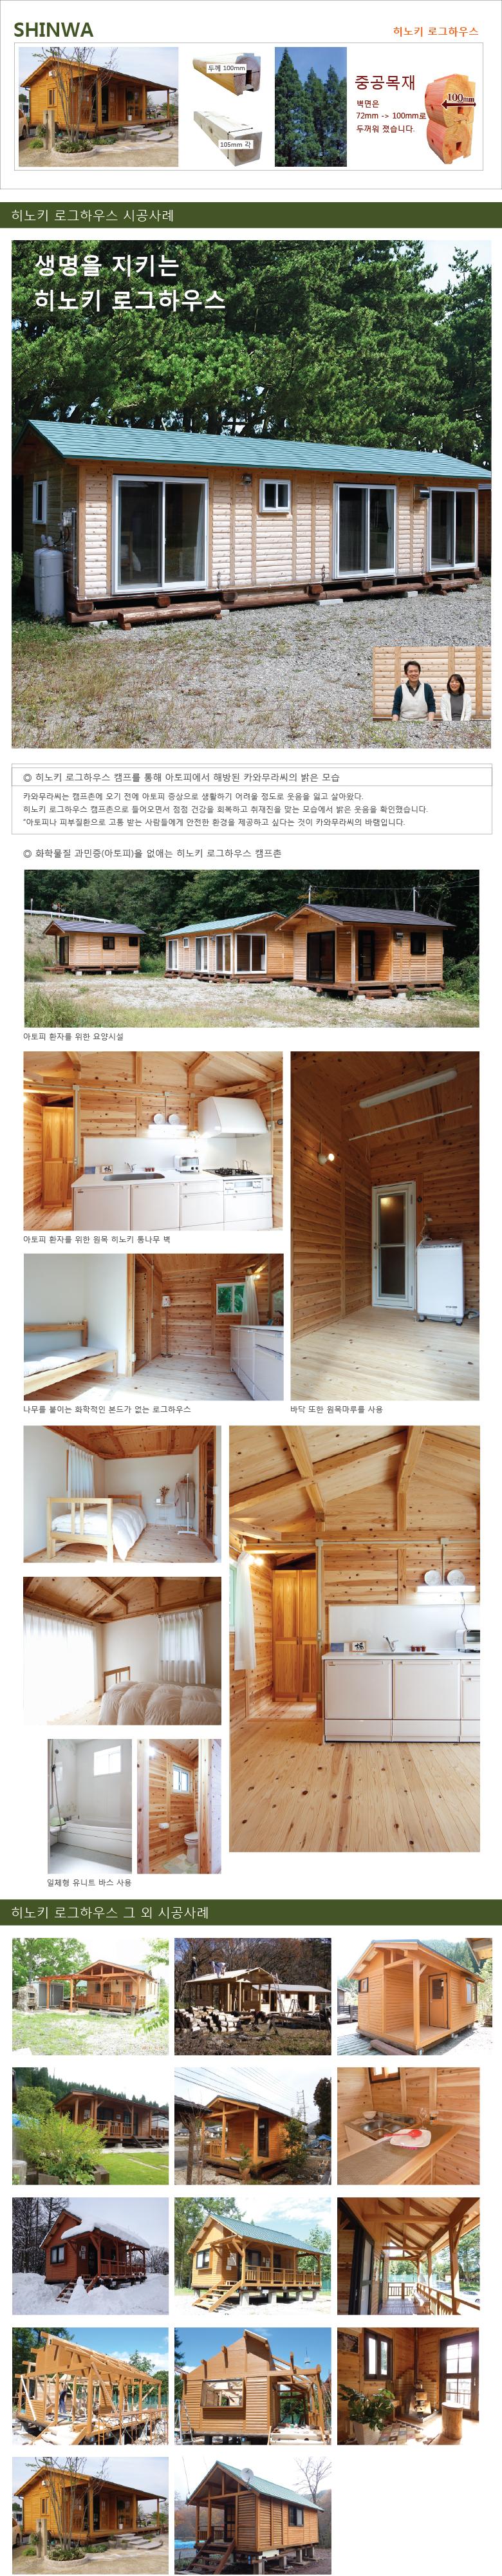 SHINWA_히노끼-하우스-시공사례_1.jpg